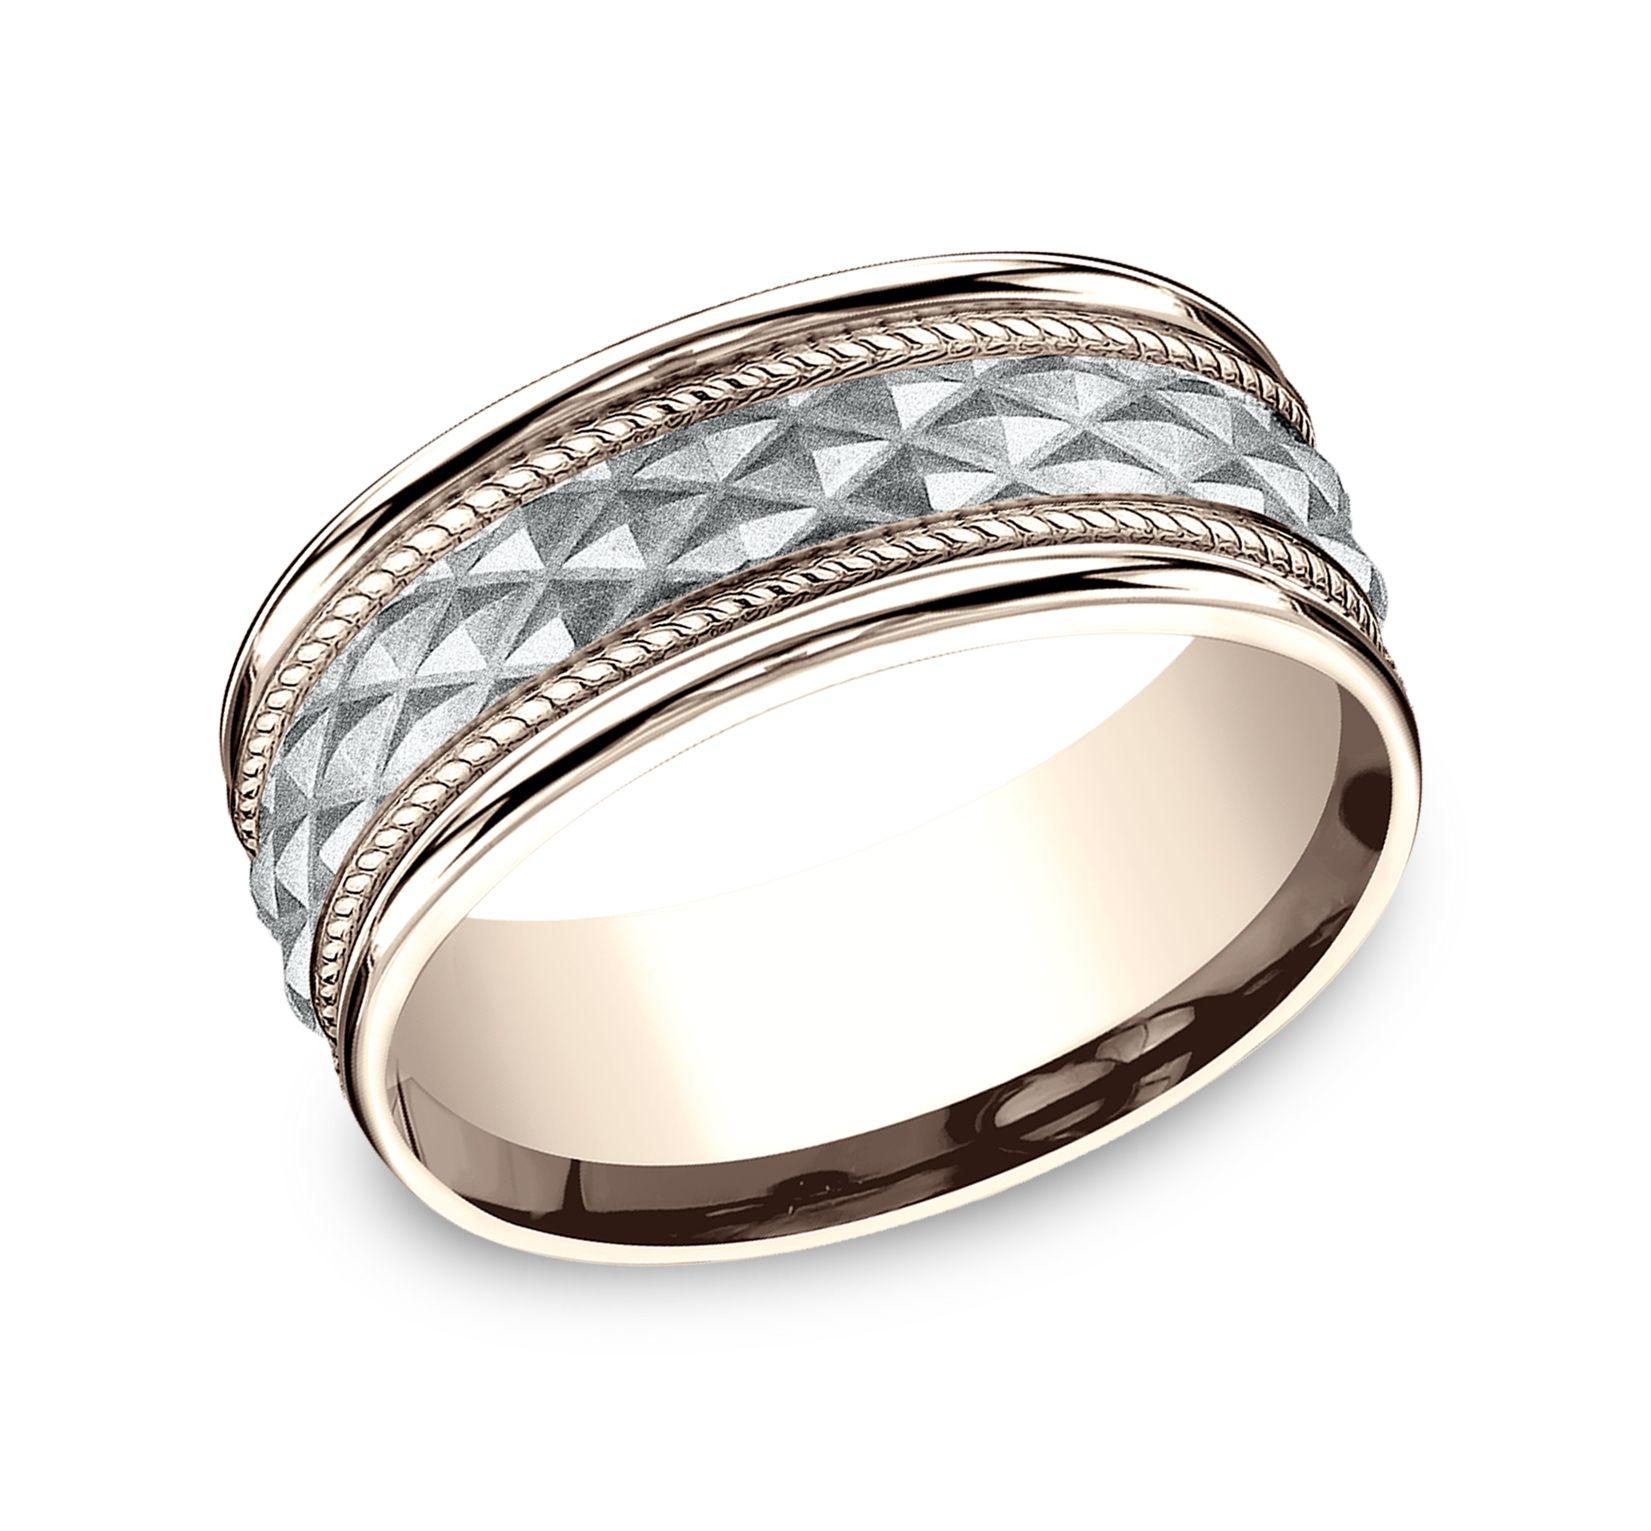 Benchmark Sculpted Wedding Bands Mens diamond wedding